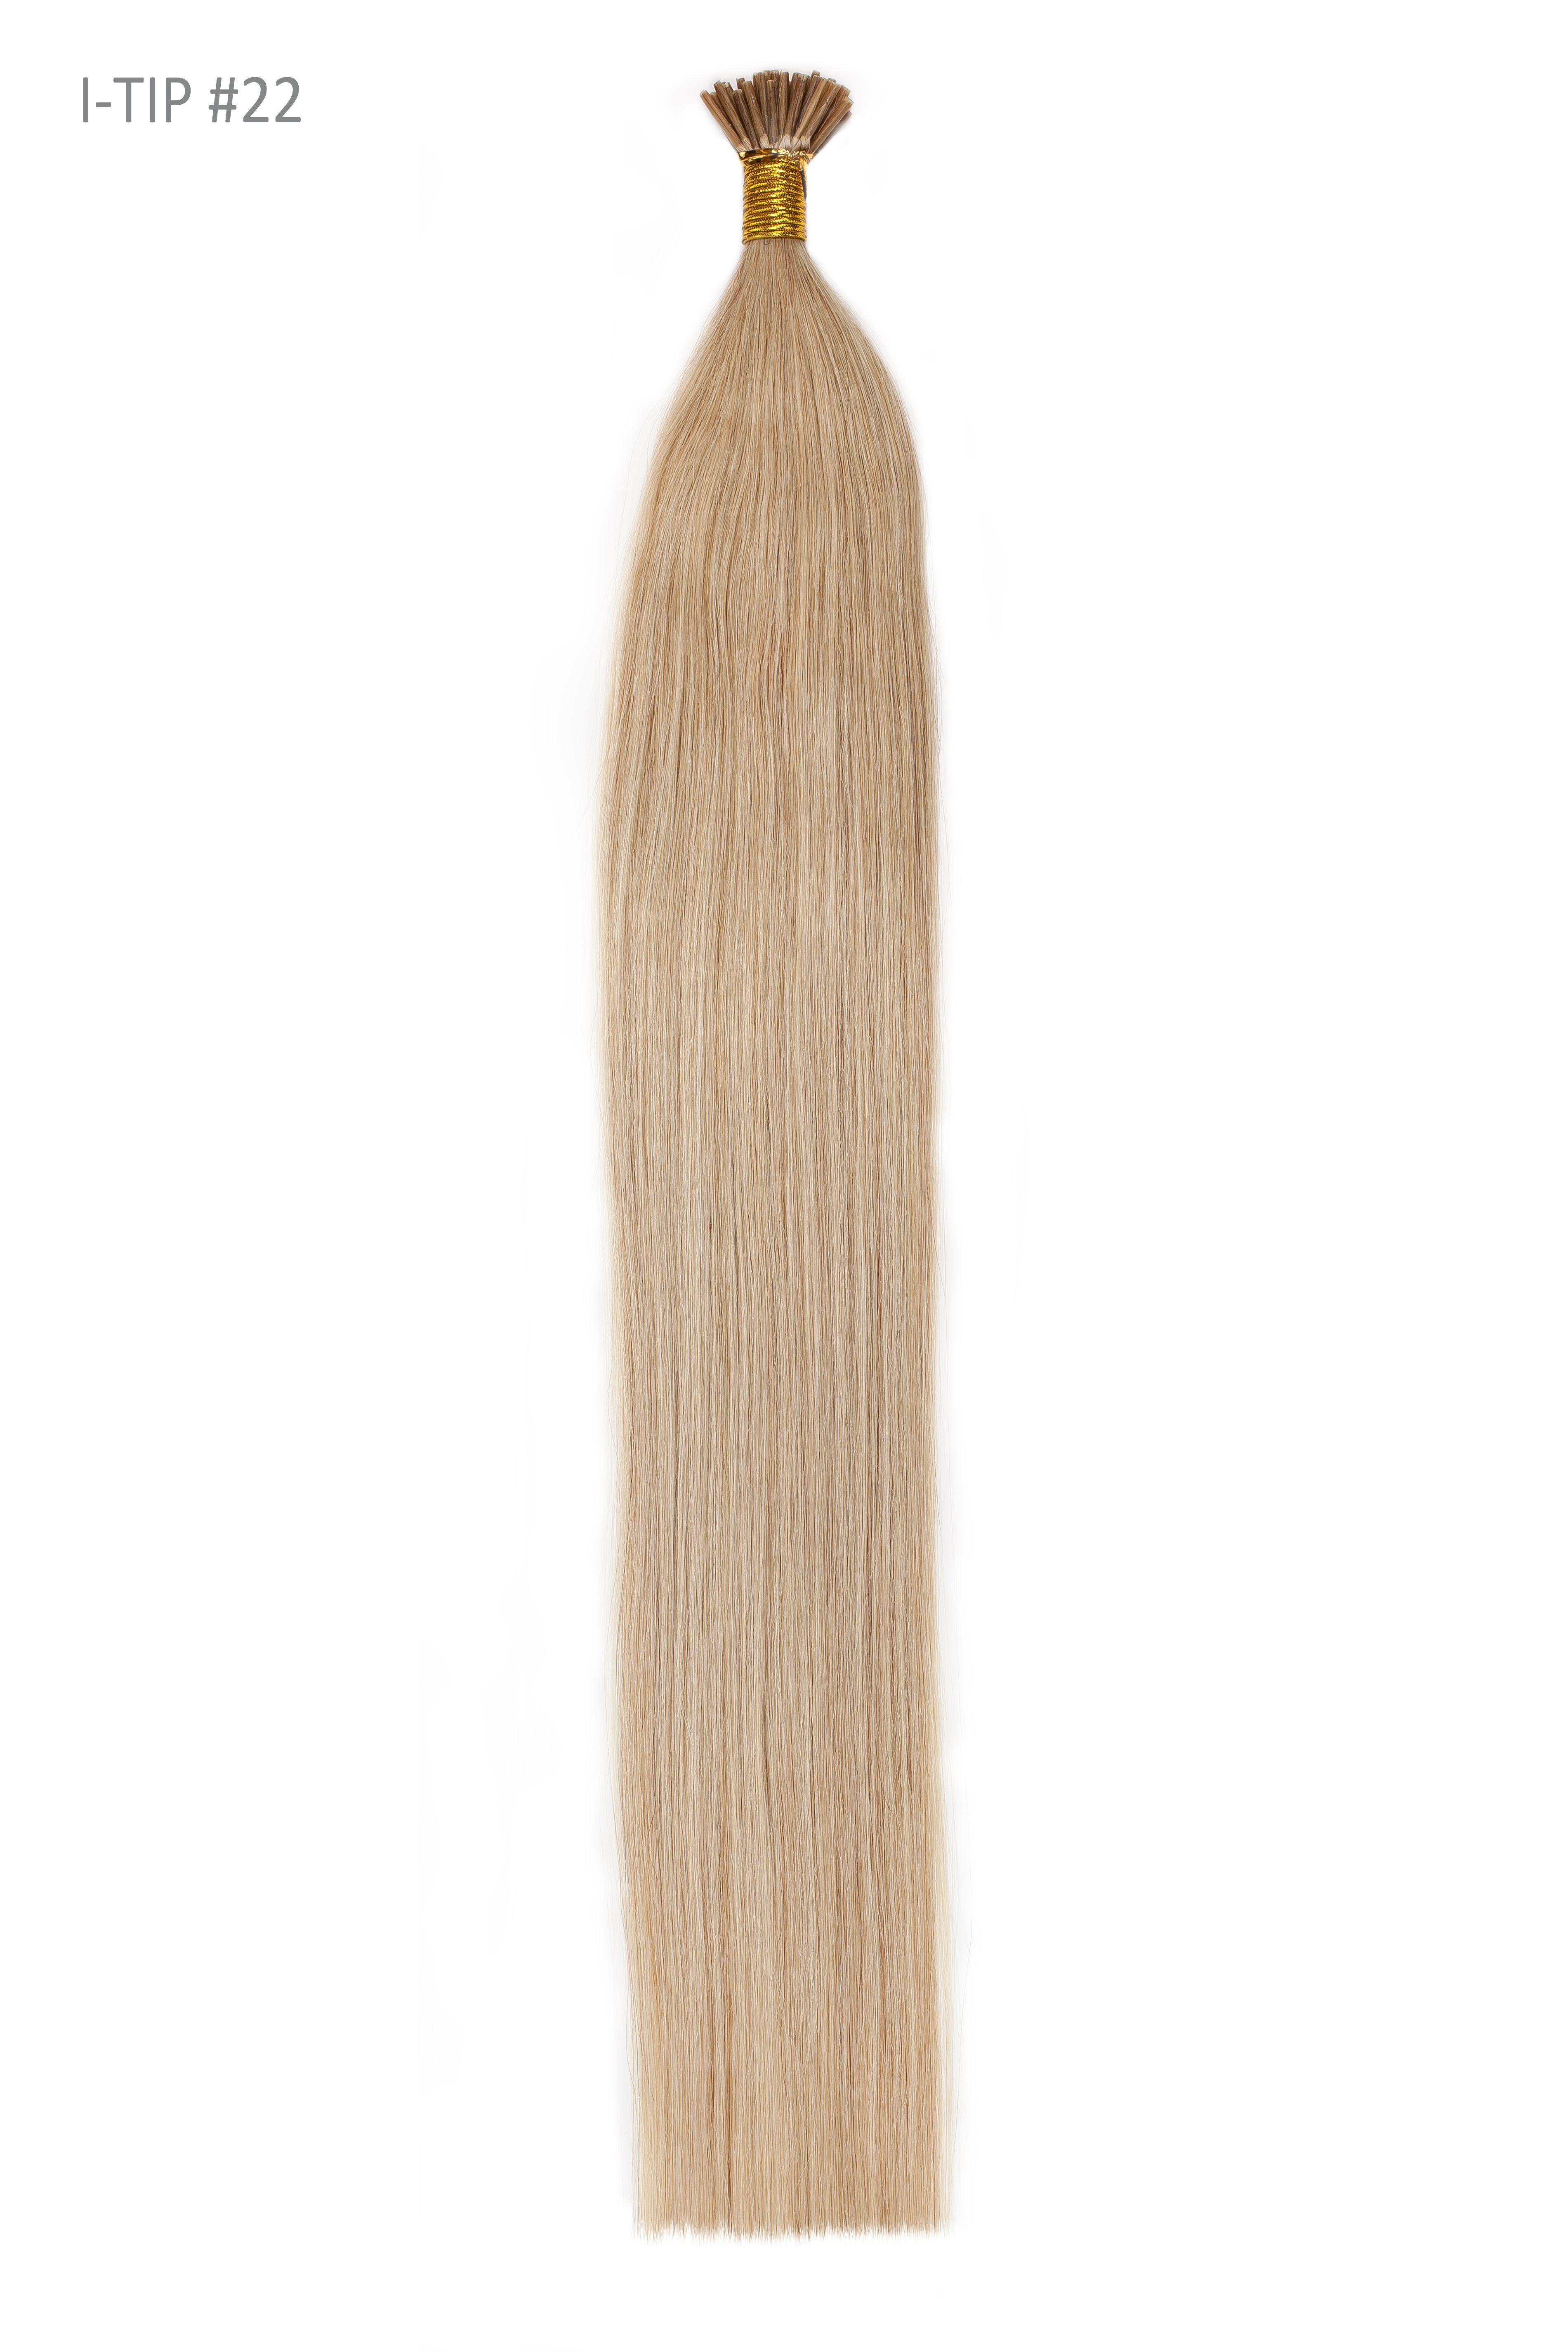 22 Inch Stick Tip / I-Tip Pre-bonded Remy Human Hair Extensions - Light Ash Blonde (#22) #lightashblonde